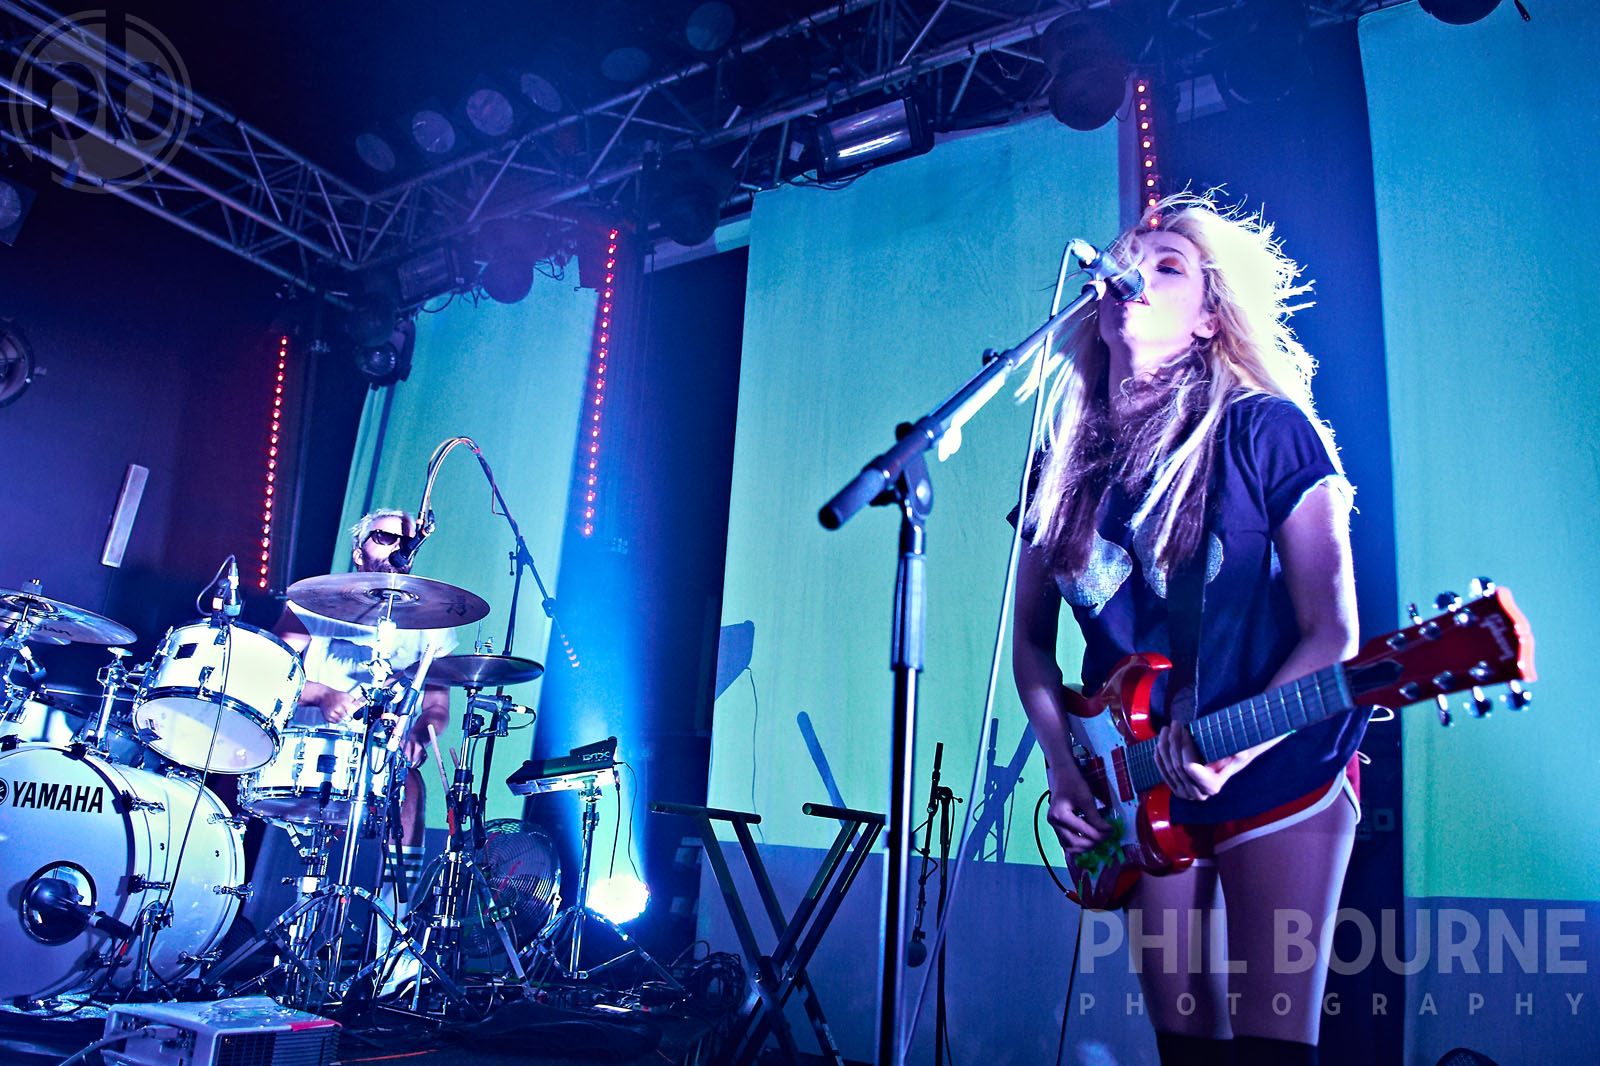 049_Live_Music_Photographer_London_Ting_Tings_001.jpg